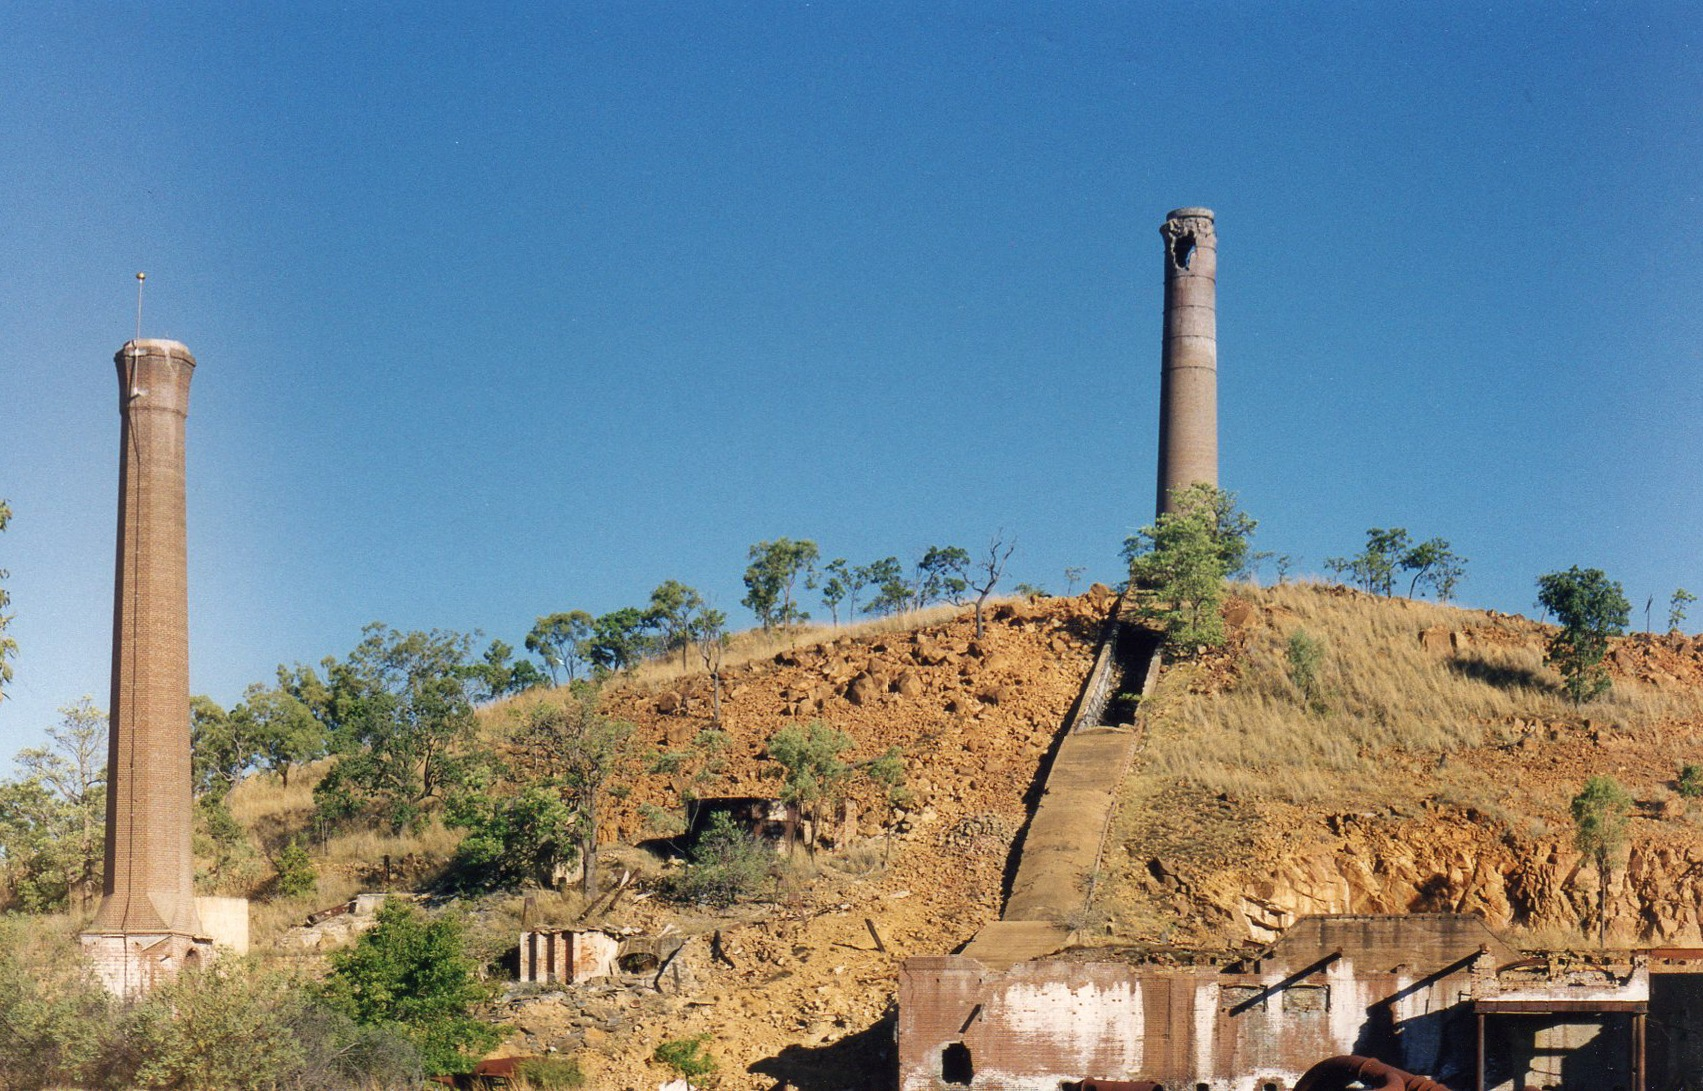 Smelter chimneys. by Rovert